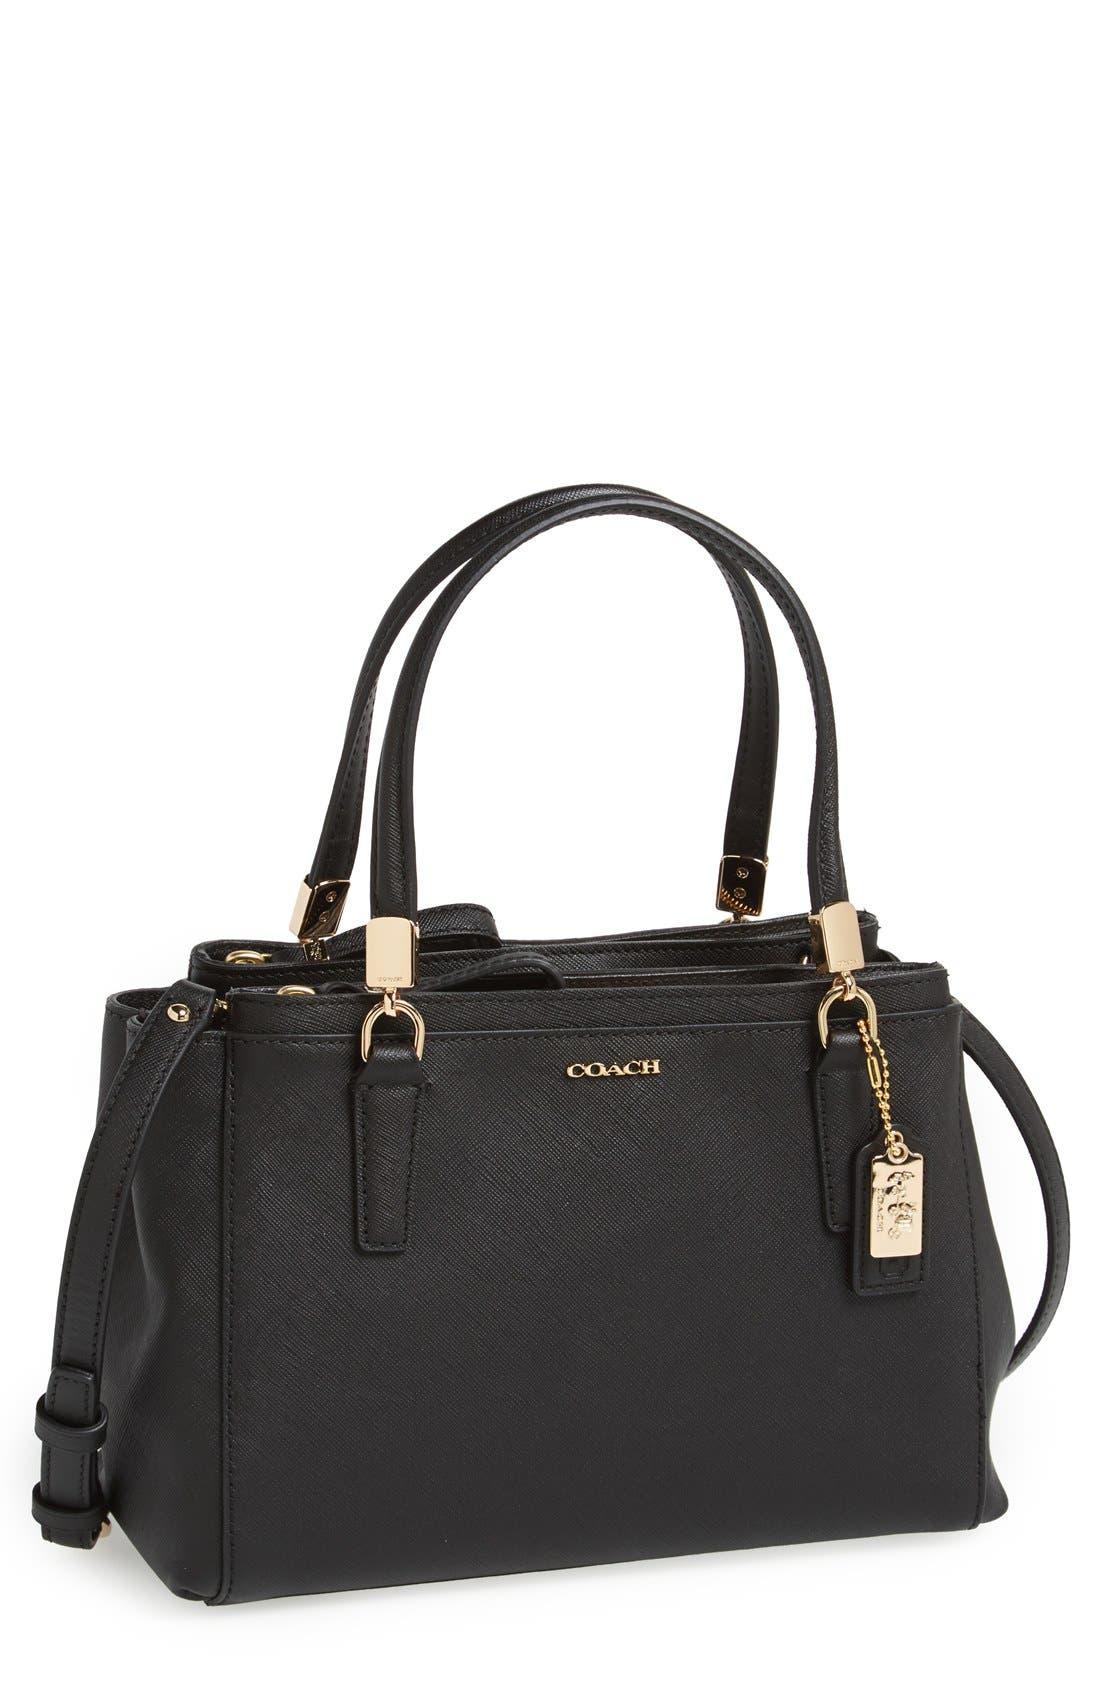 COACH 'Madison - Mini Christie' Saffiano Leather Satchel, Main, color, 001